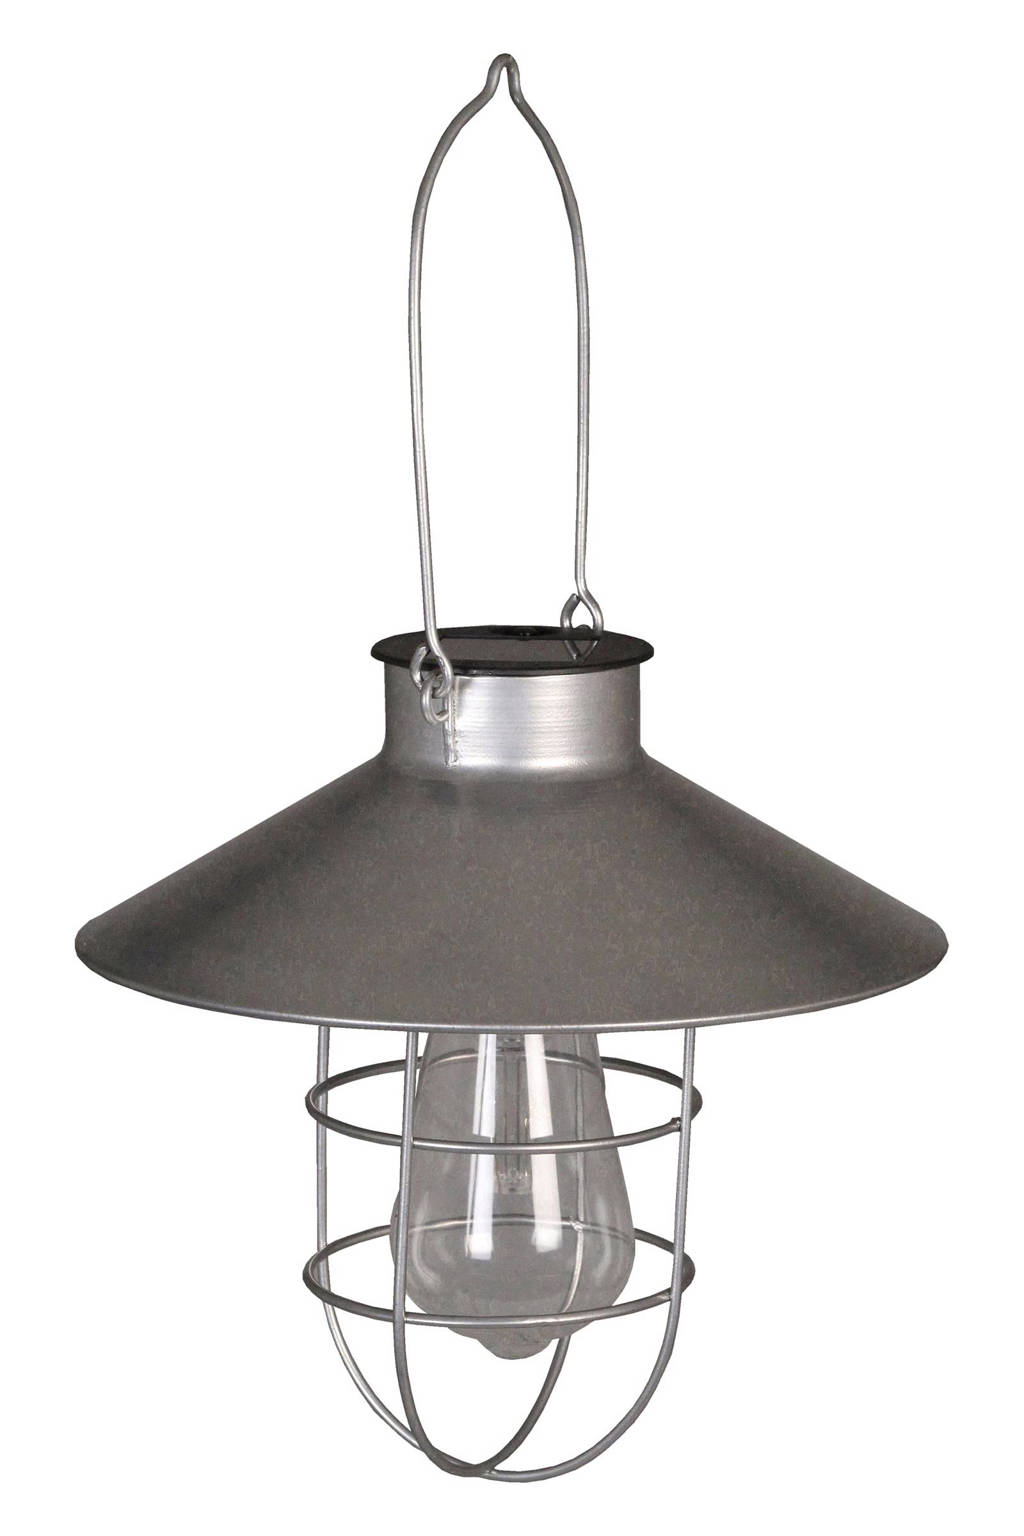 Luxform hanglamp Ravenna (solar), Zilver